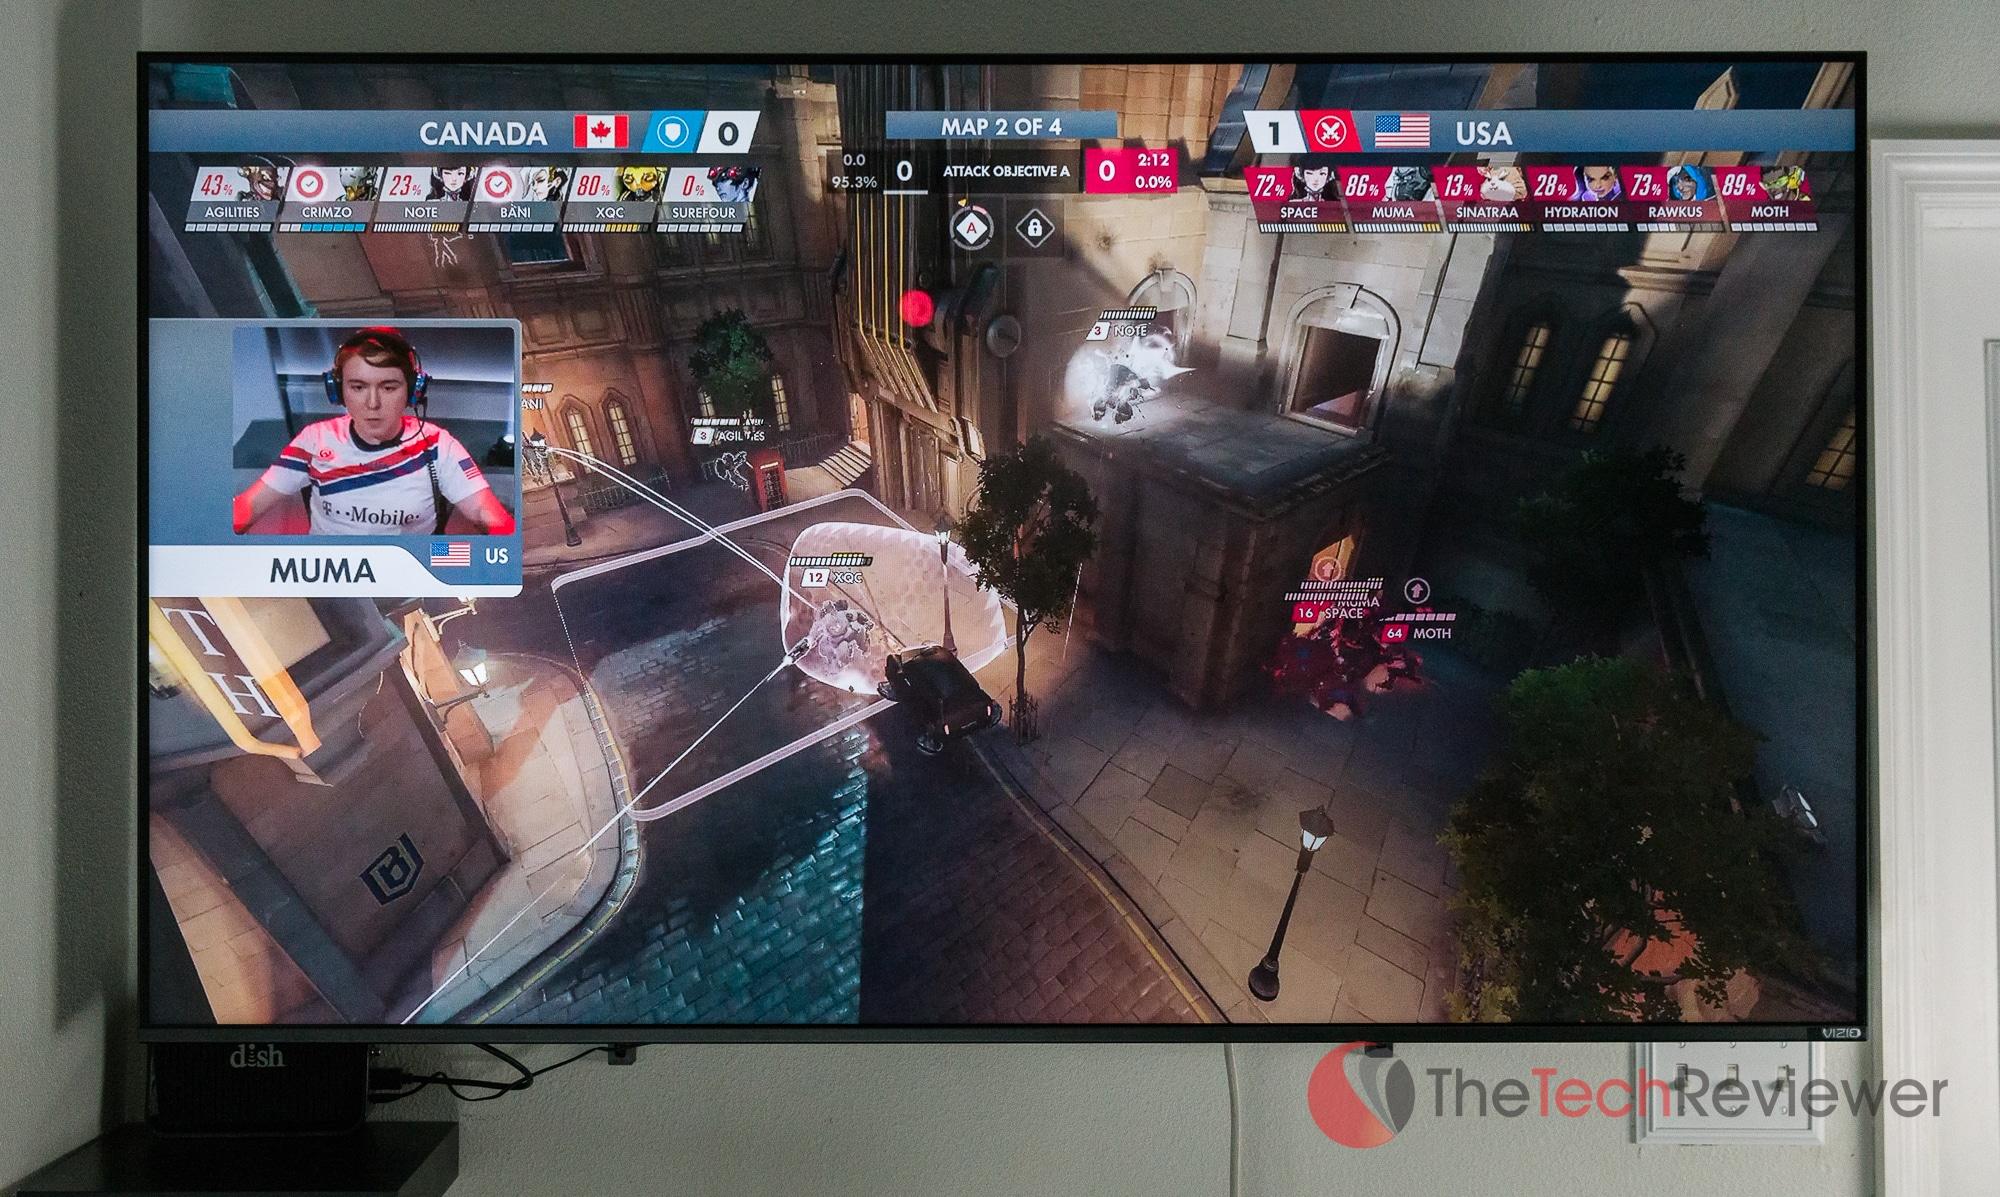 Blizzard's Overwatch World Cup streaming to the VIZIO M65-F0 via the internal Chromecast.